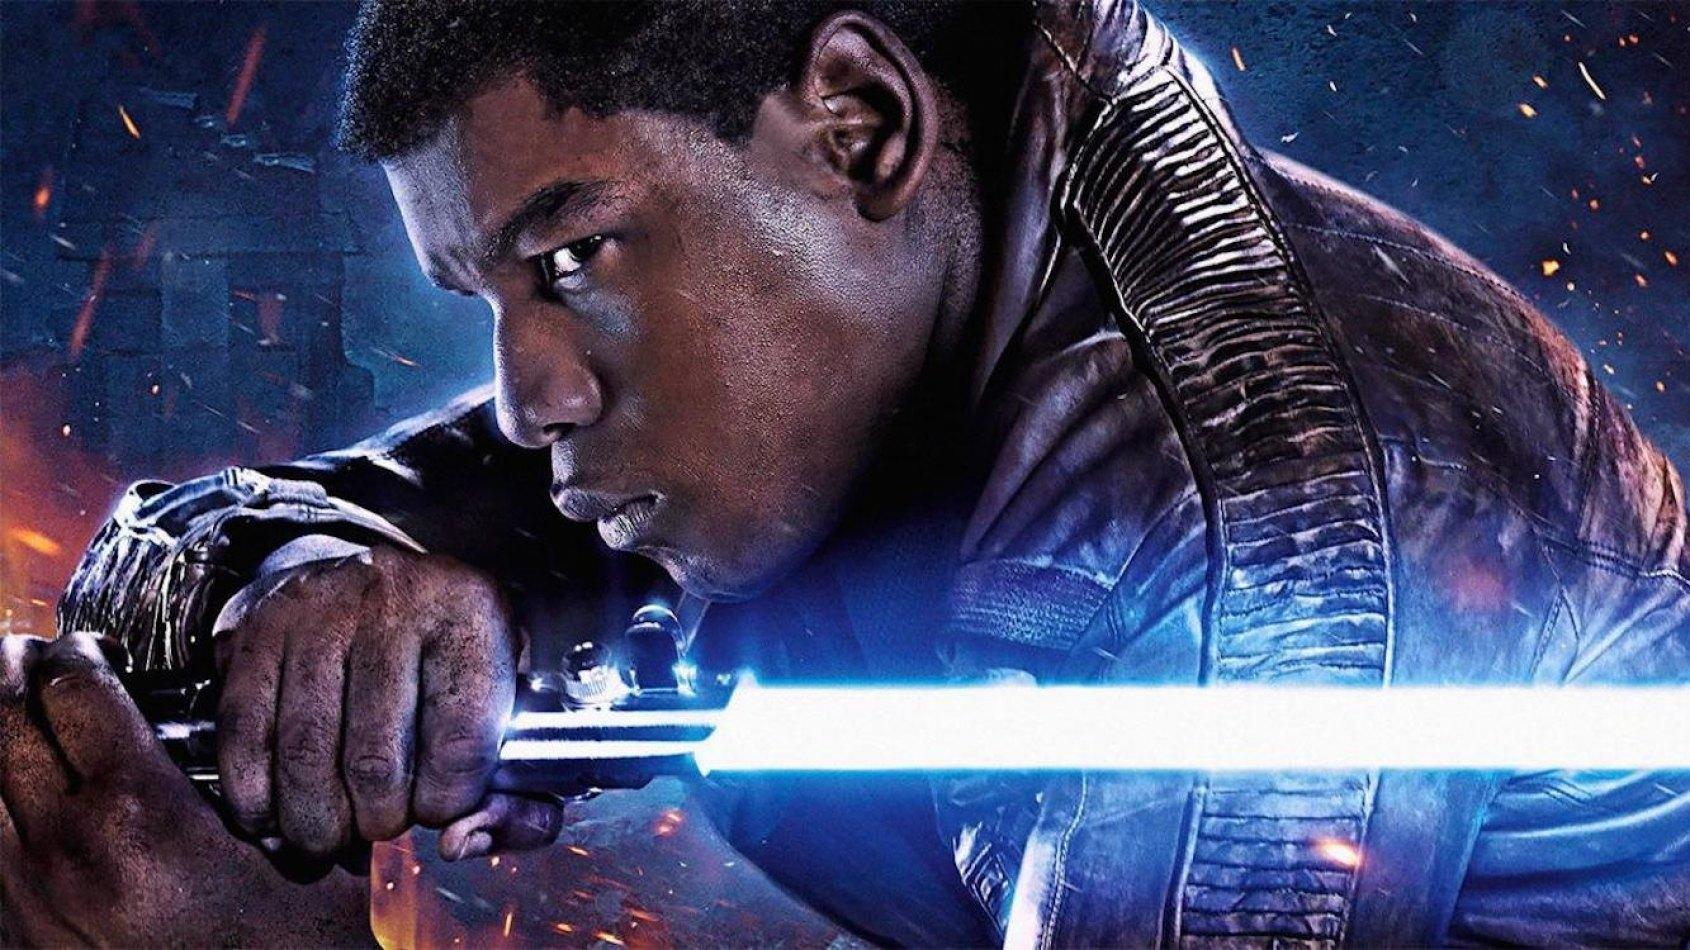 Star Wars VIII serait plus sombre selon John Boyega.